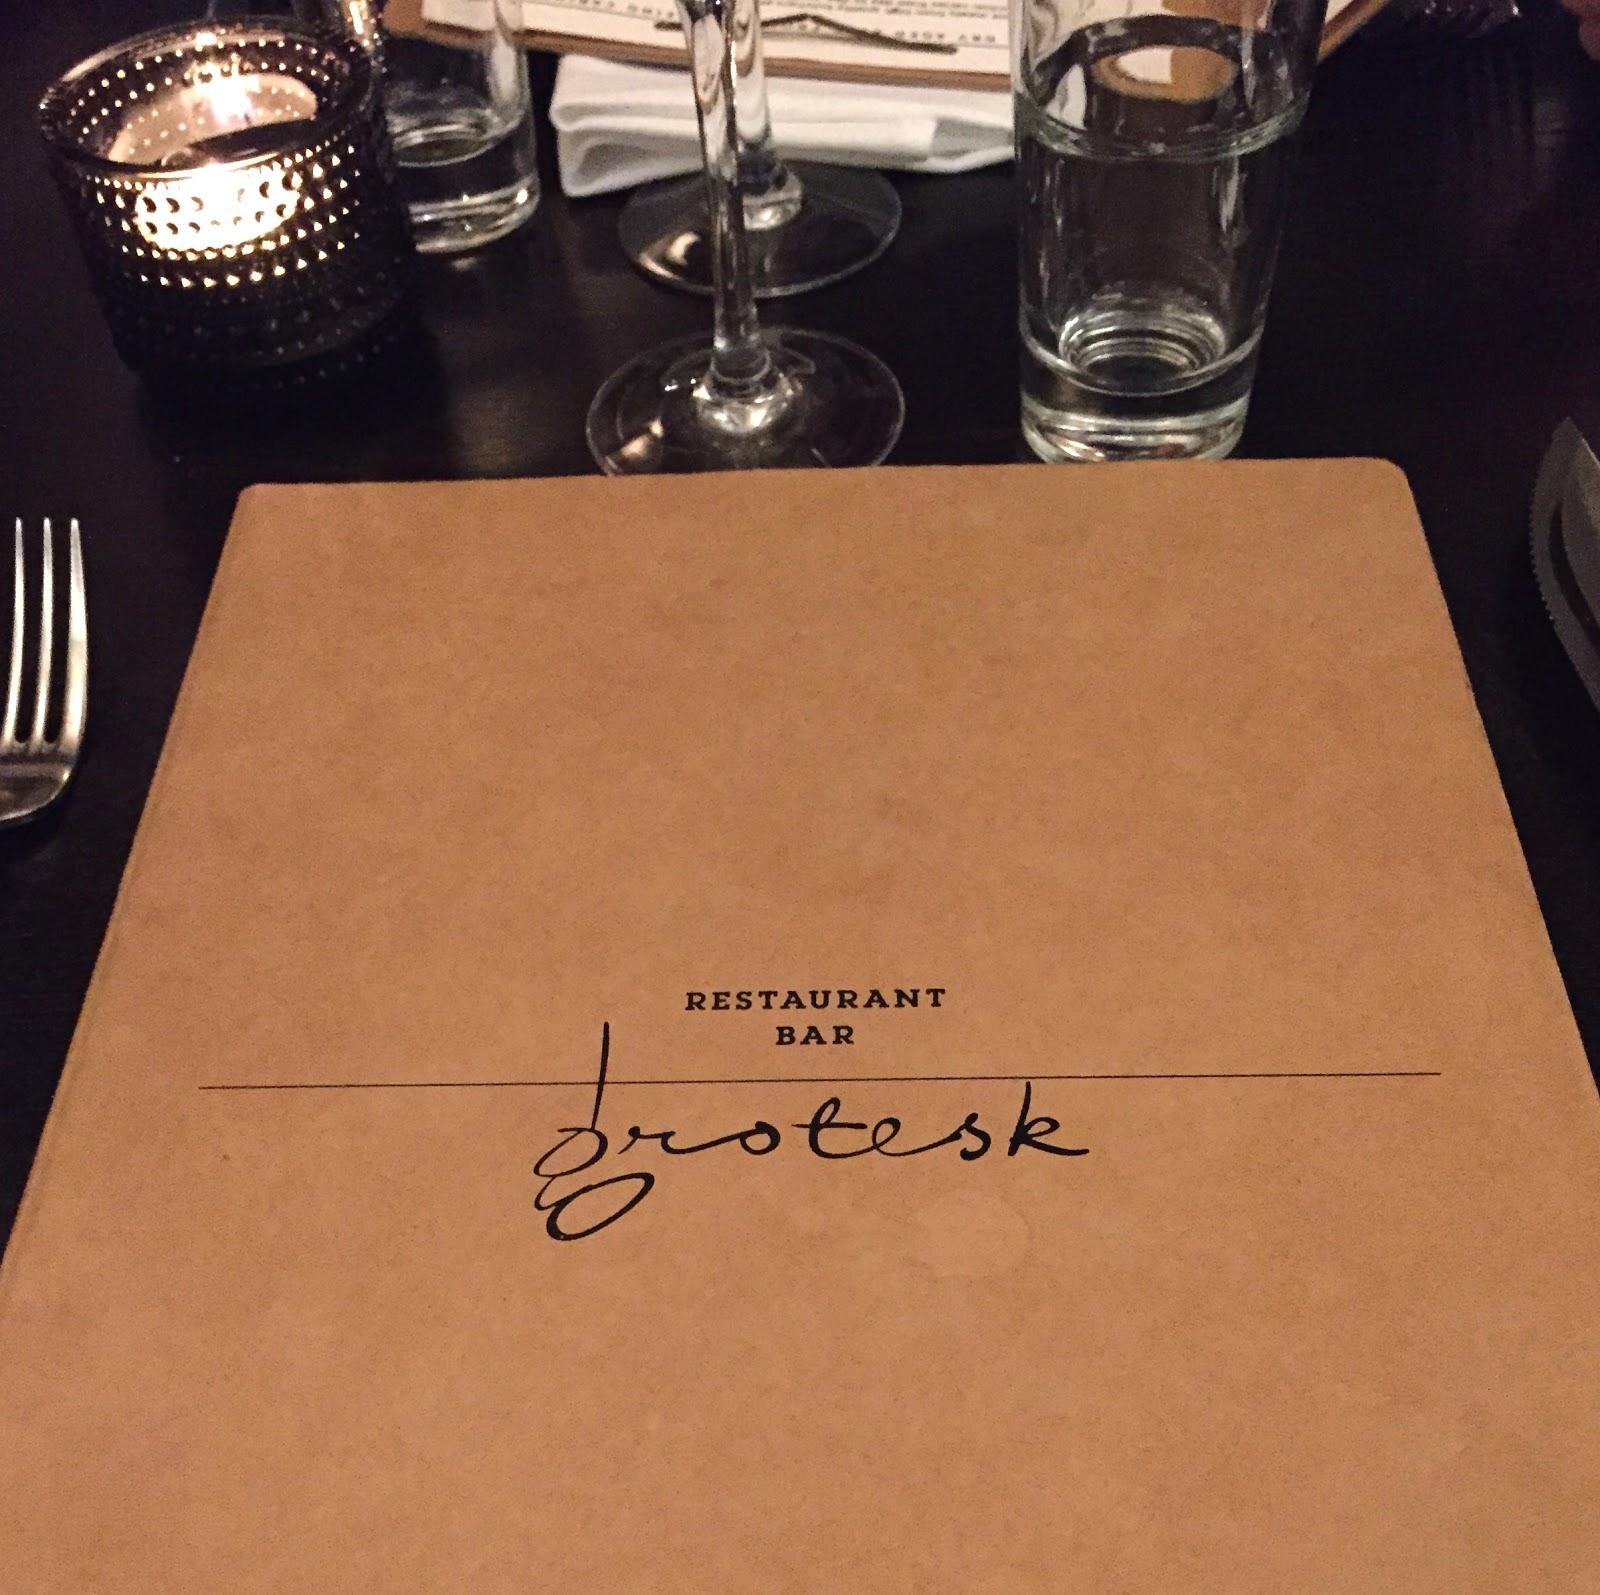 grotesk helsinki, grotesk review helsinki, grotesk menu, grotesk grill bar, grotesk restaurant helsinki